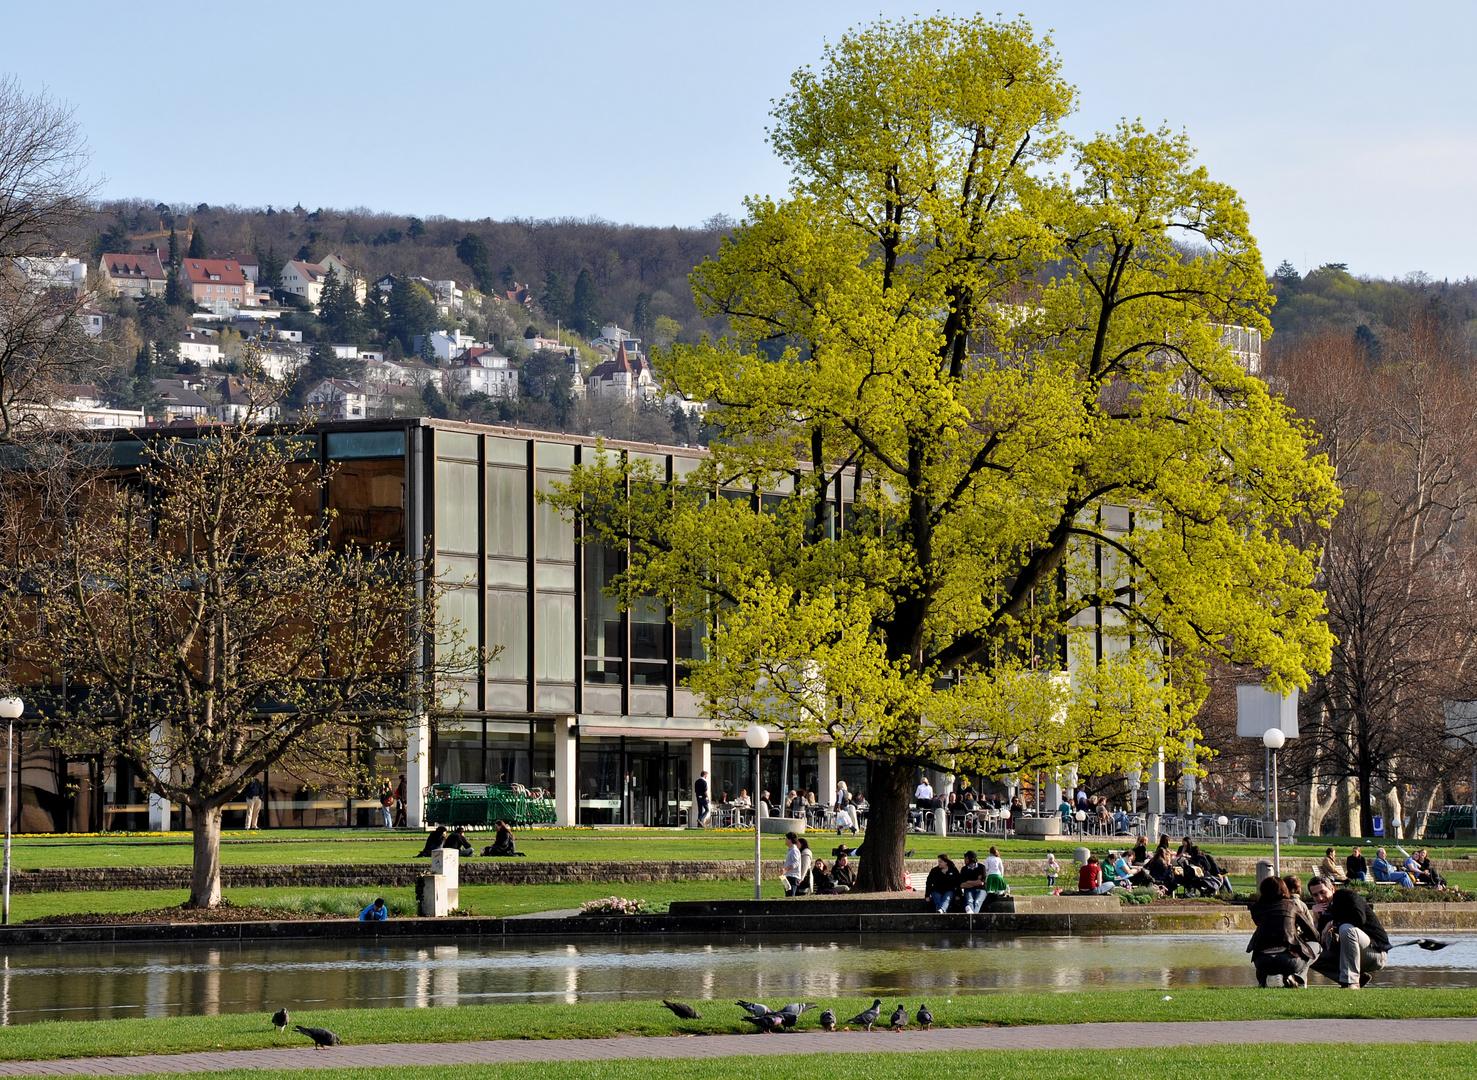 Es grünt am Stuttgarter Landtag :-)))